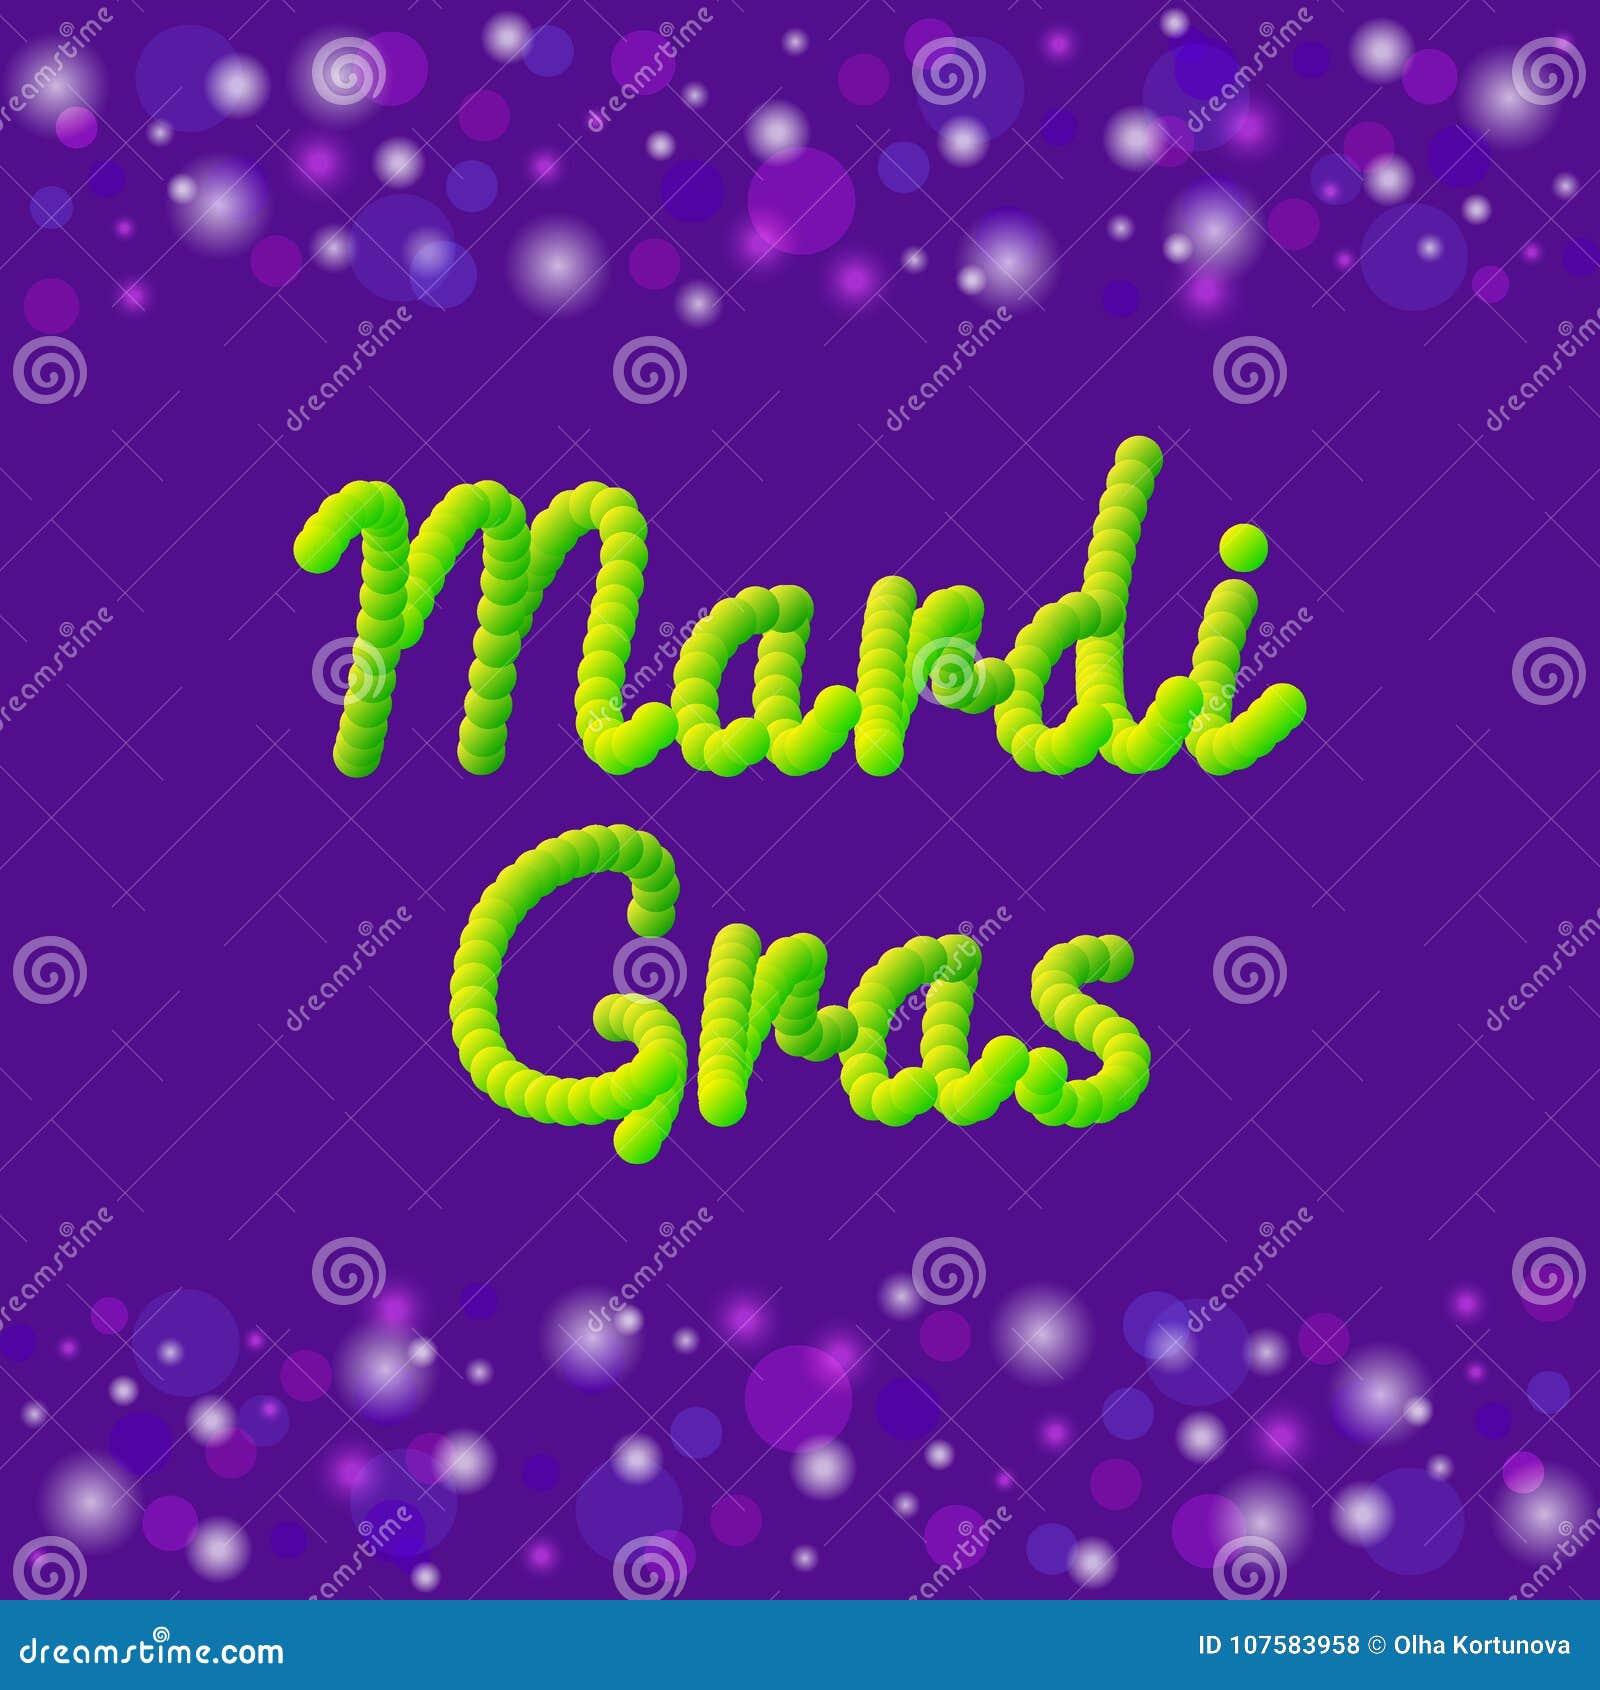 Mardi gras theme vector banner or greeting card 3d effect text download mardi gras theme vector banner or greeting card 3d effect text traditional violet m4hsunfo